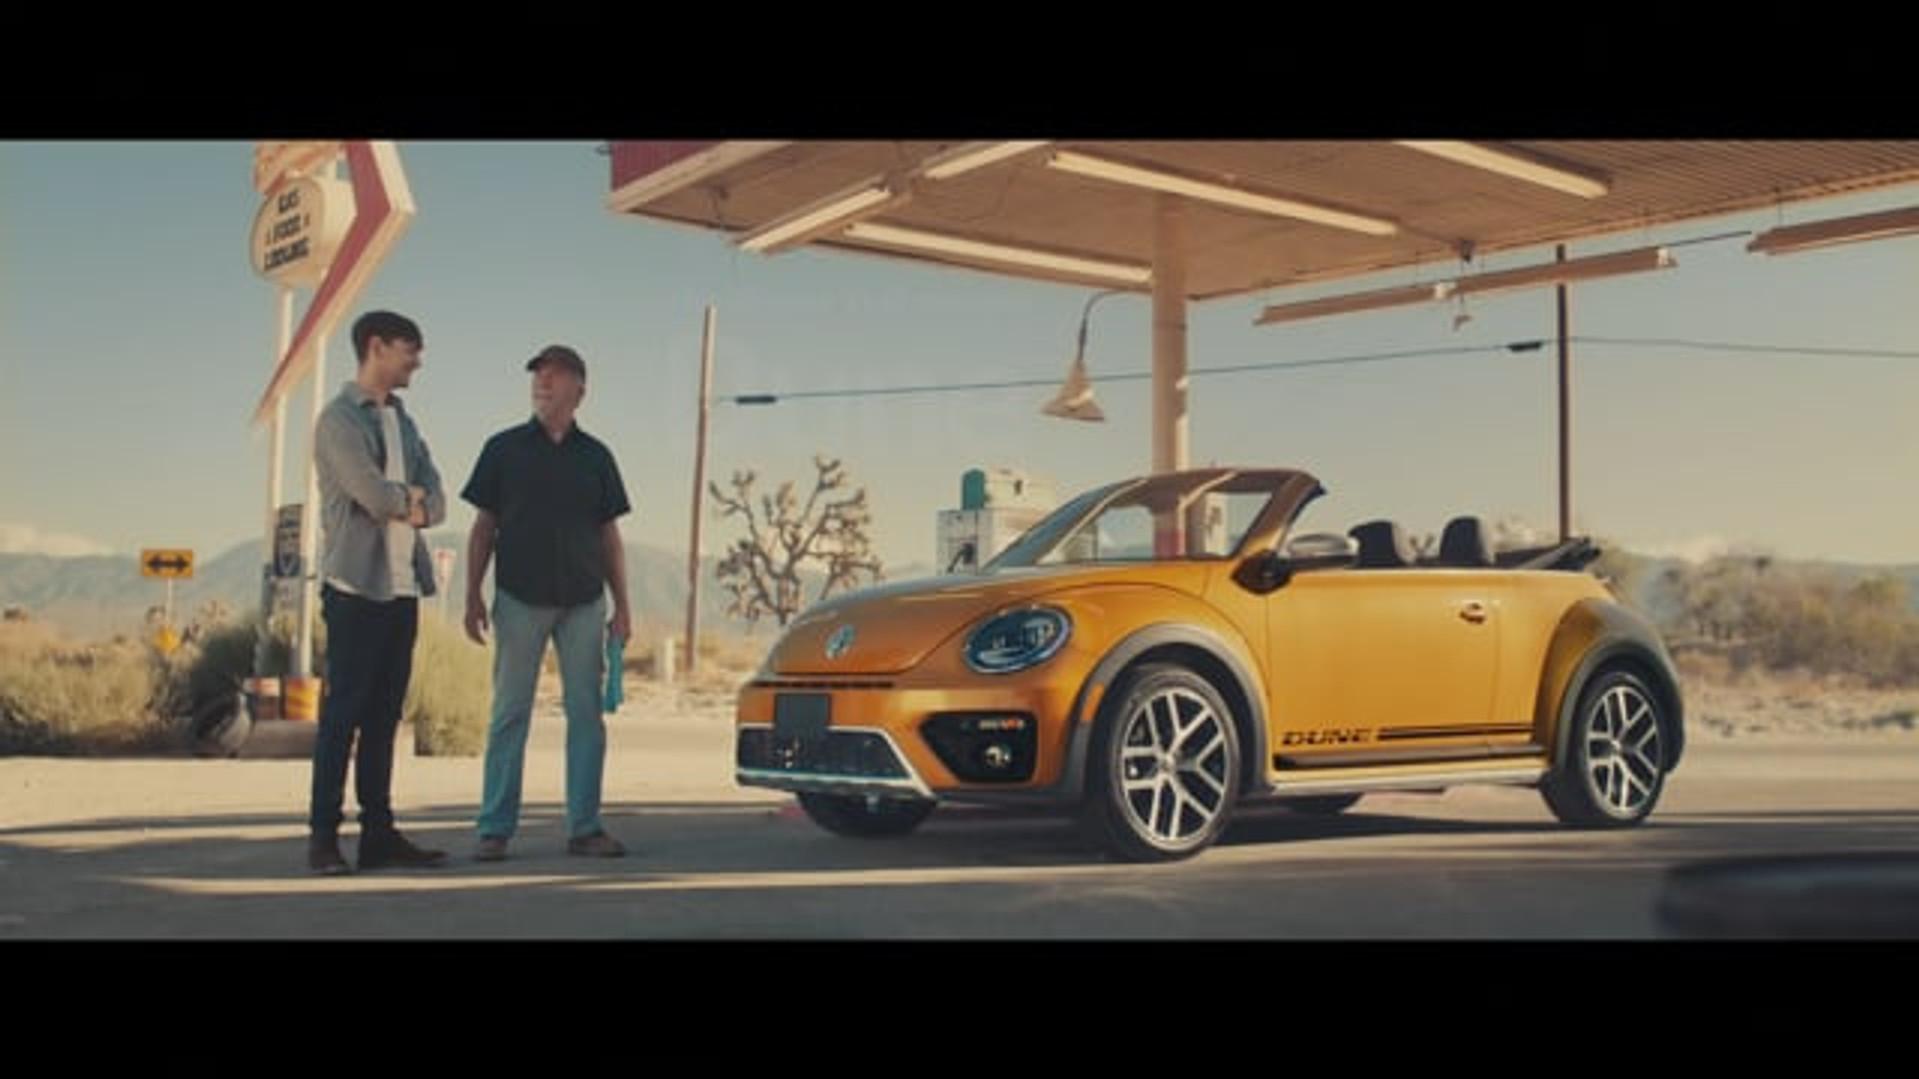 VW - New Relationship